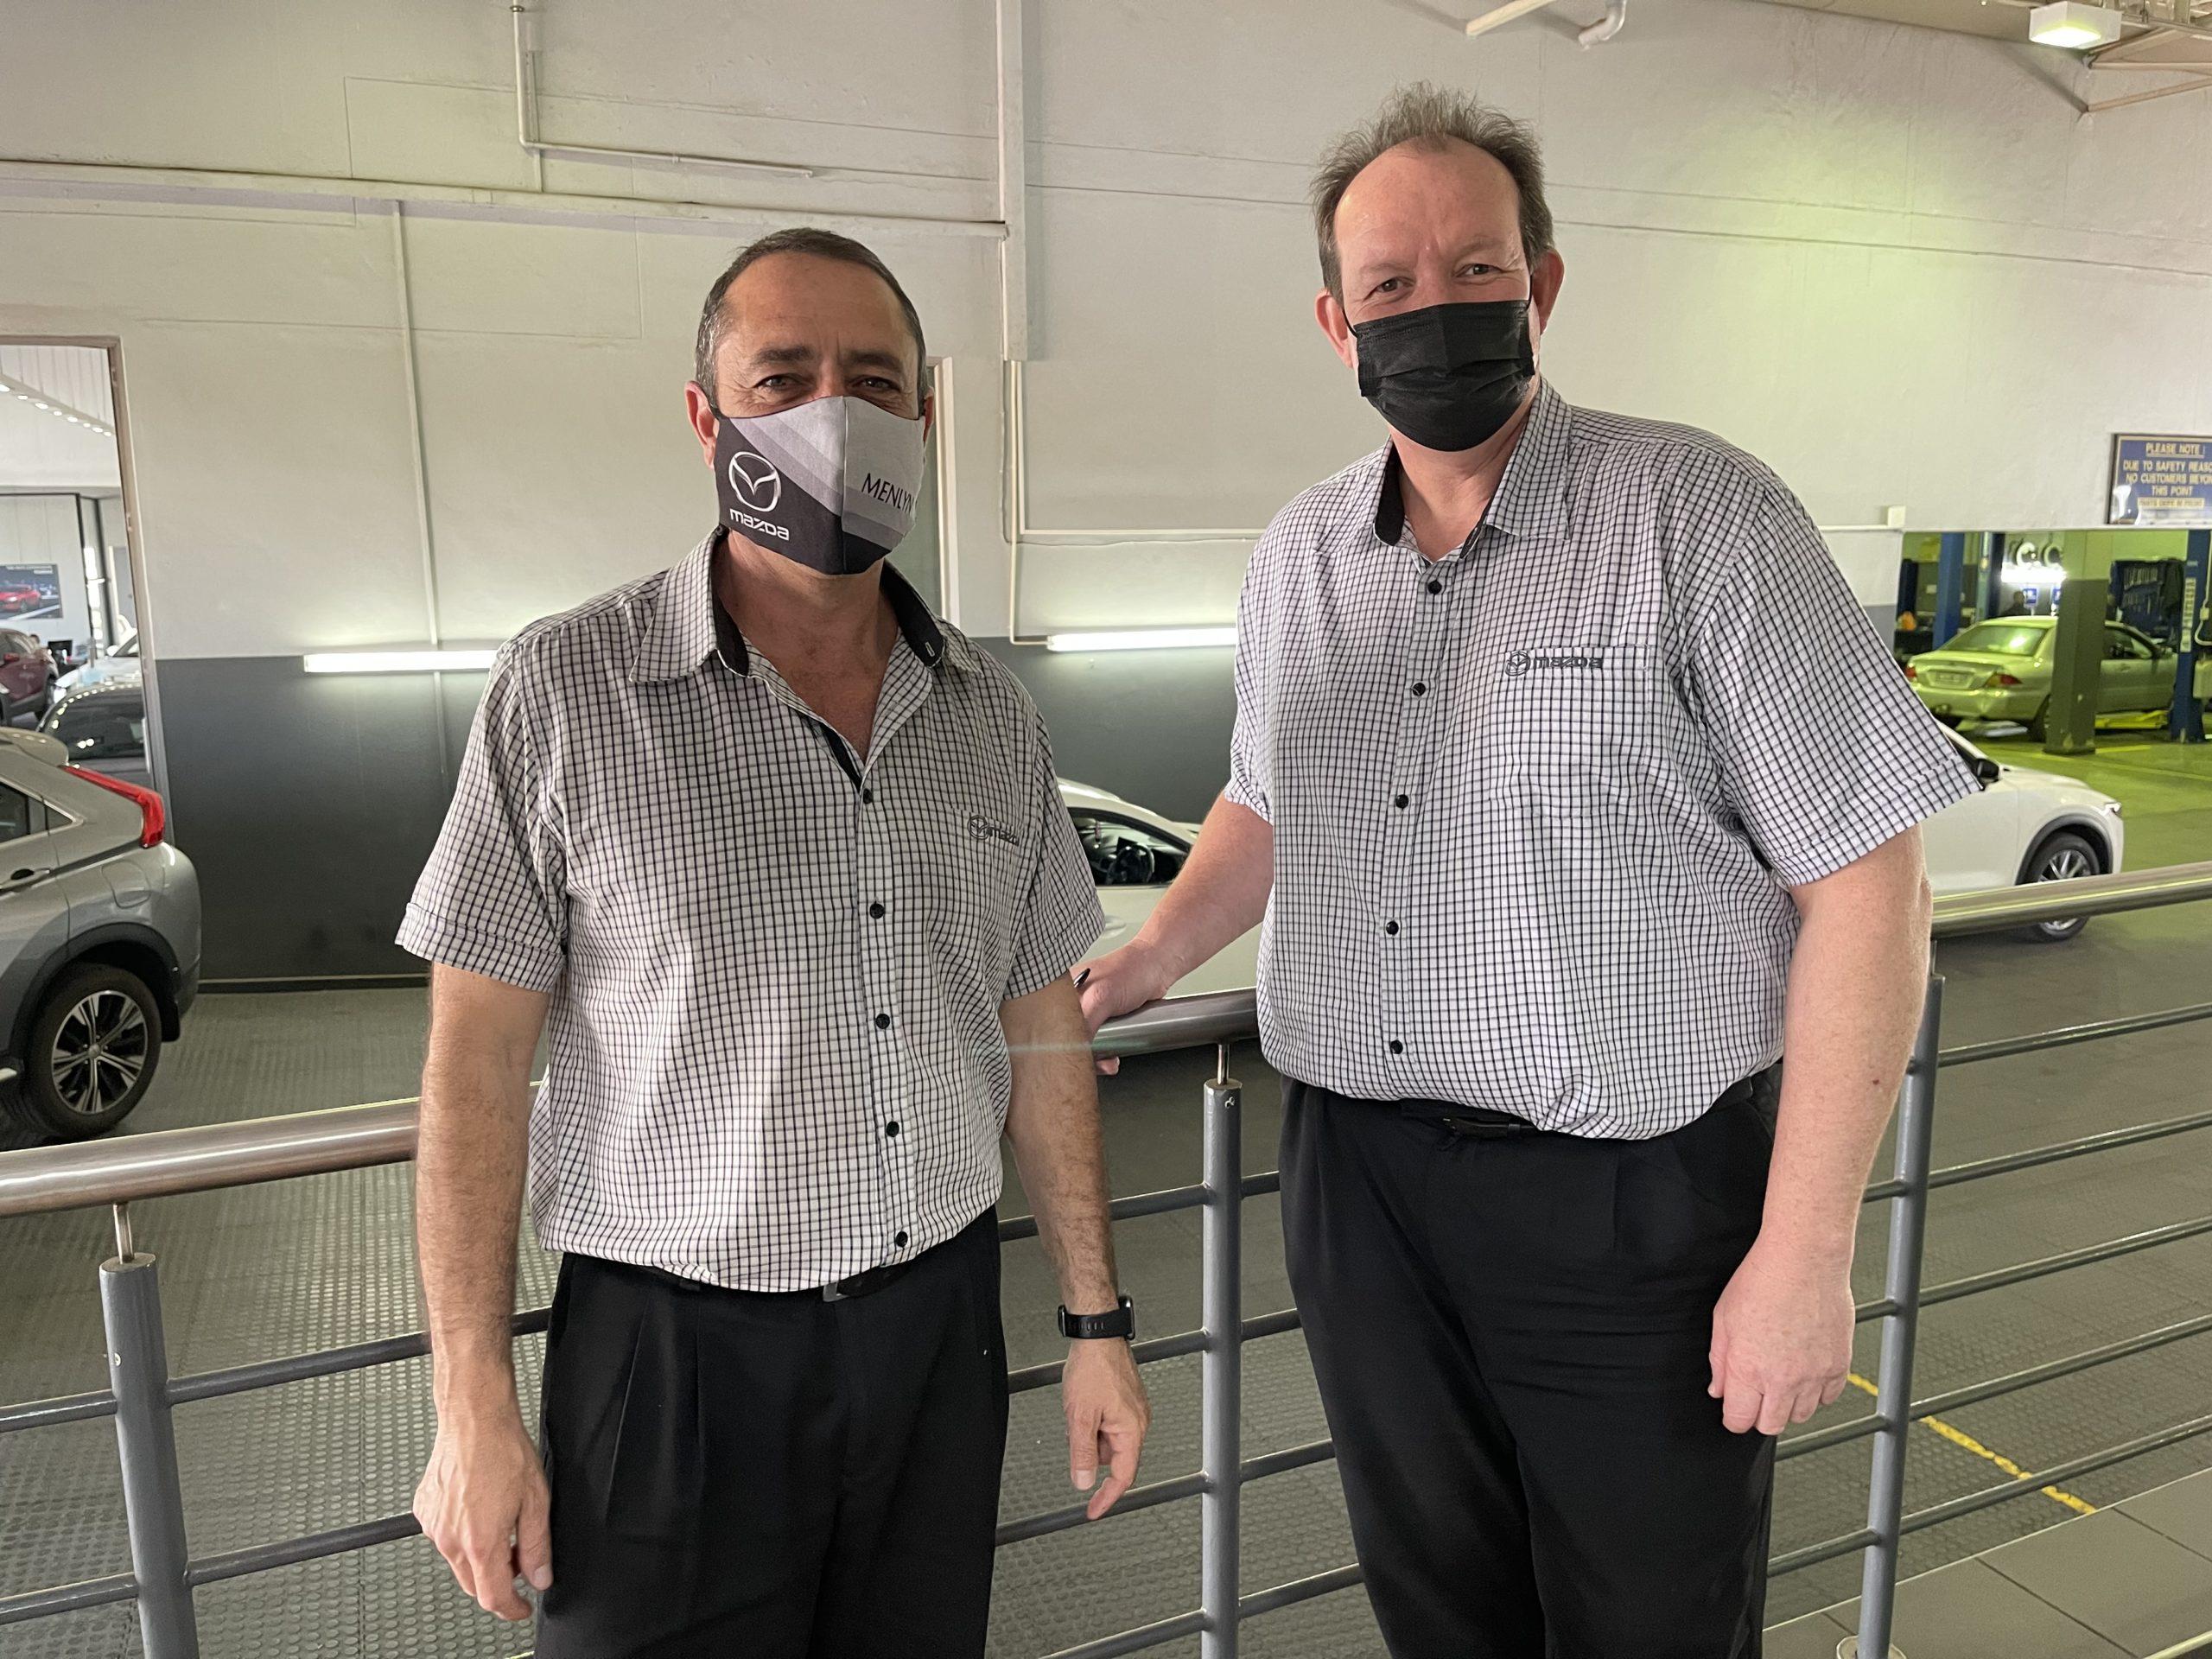 Service Advisors - Jan and Deon